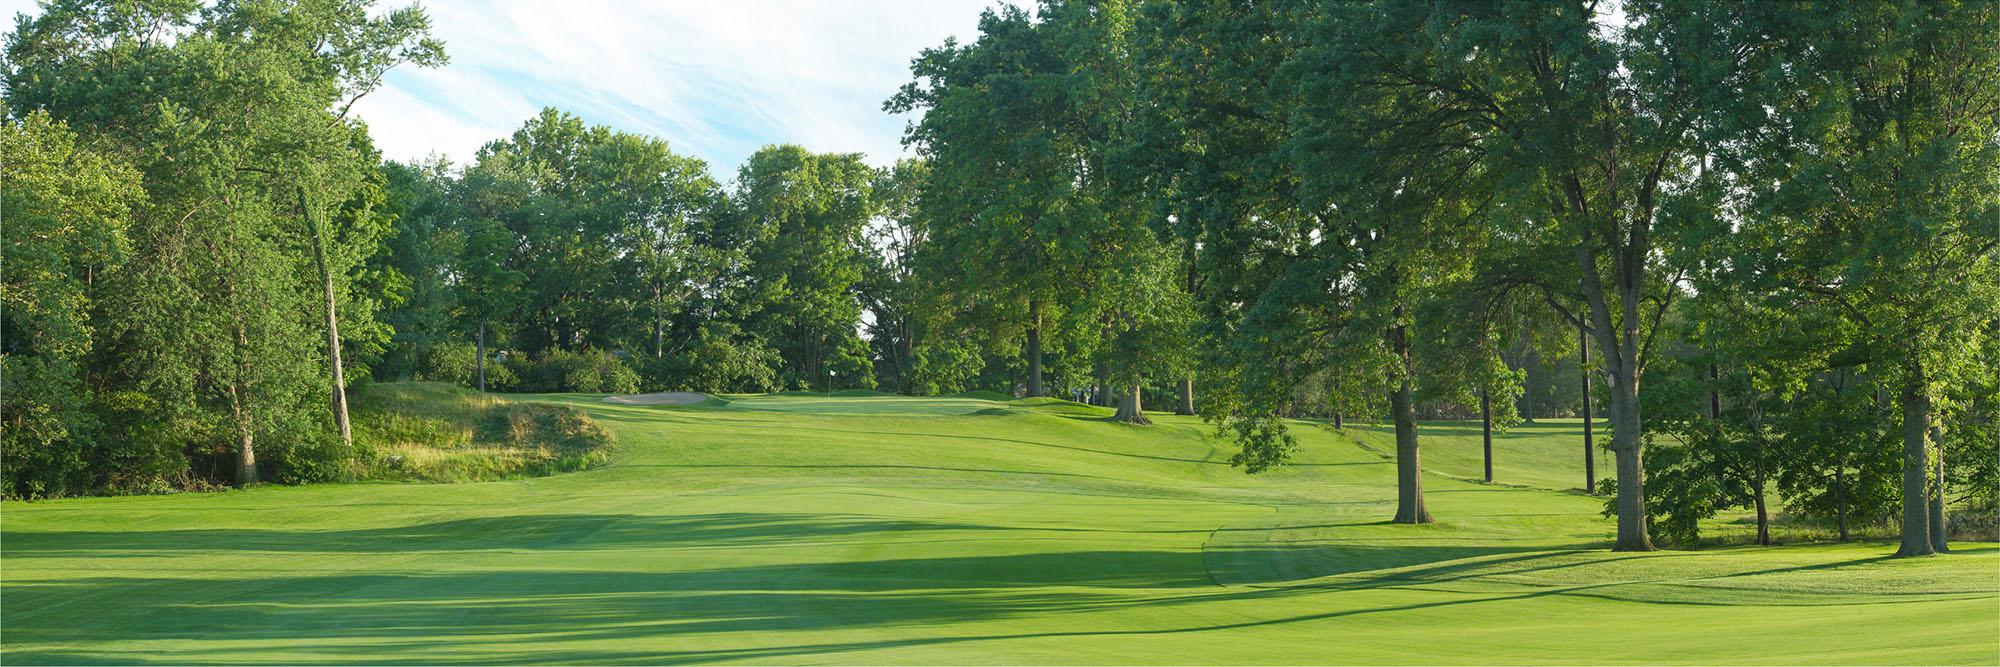 Golf Course Image - Canterbury No. 14